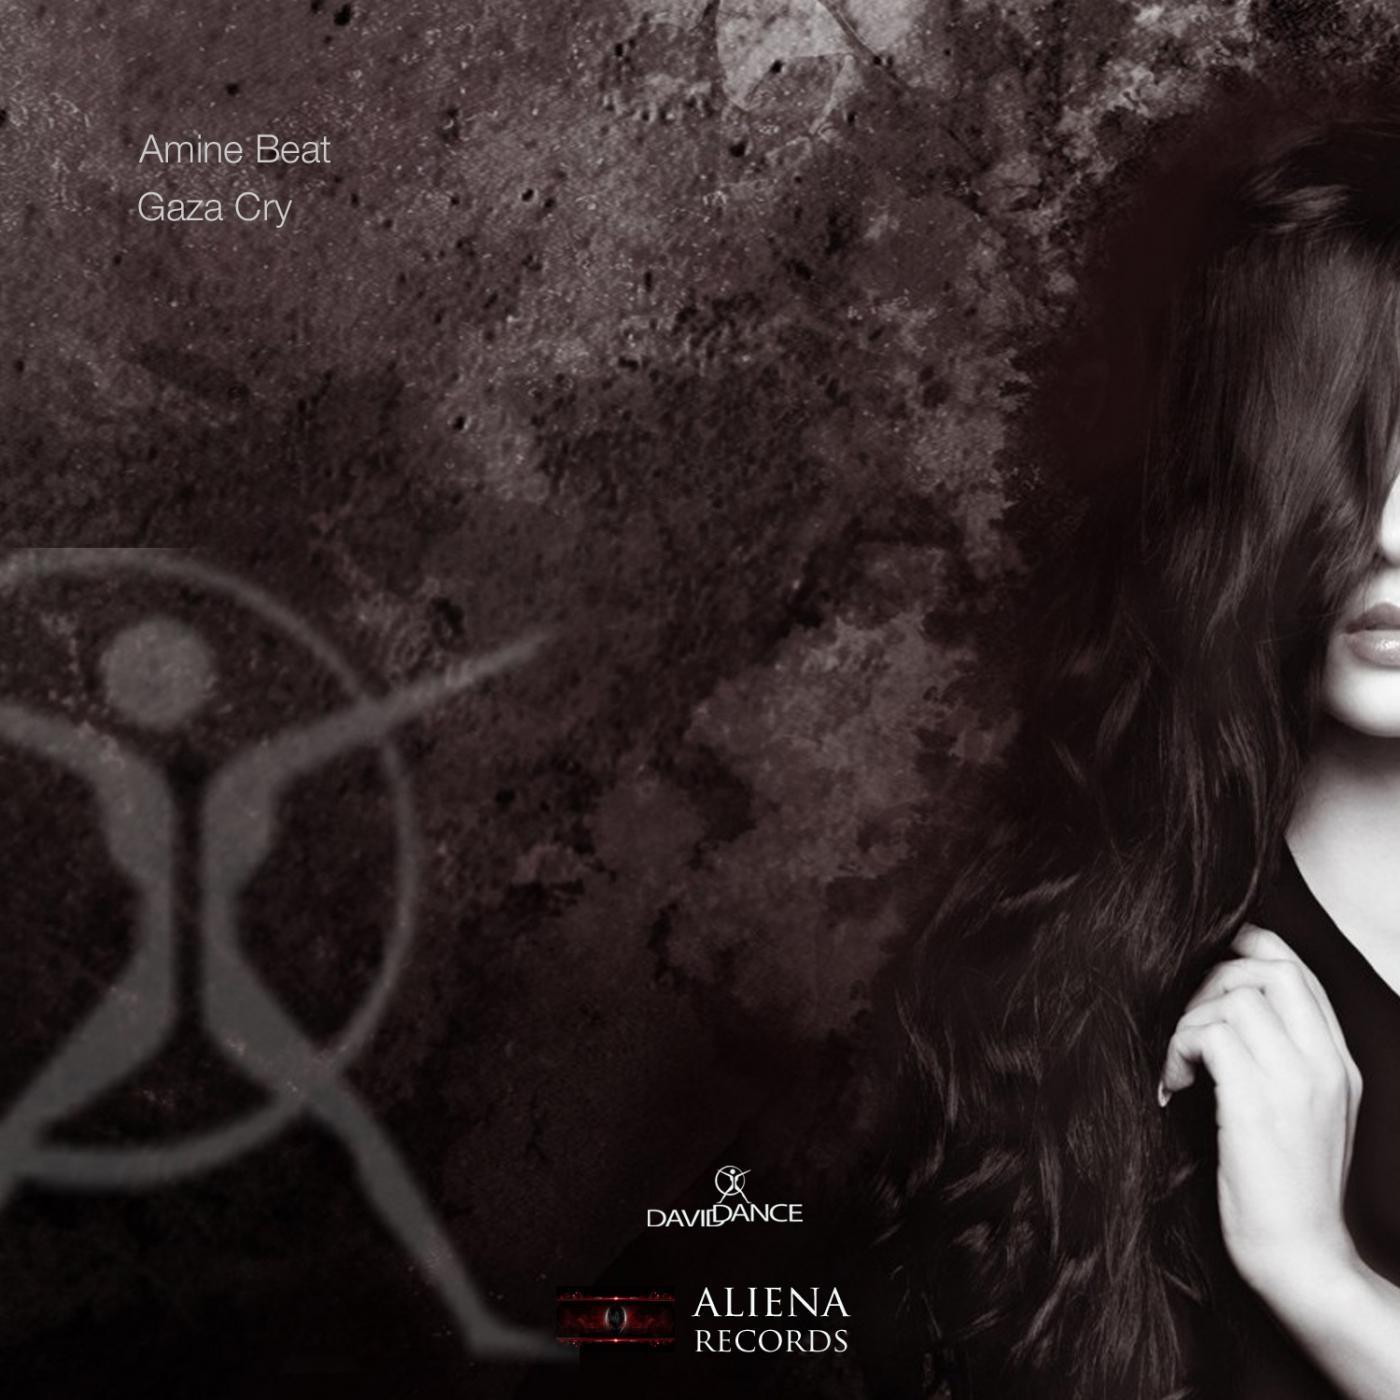 Amine Beat - Gaza Cry (Original mix)